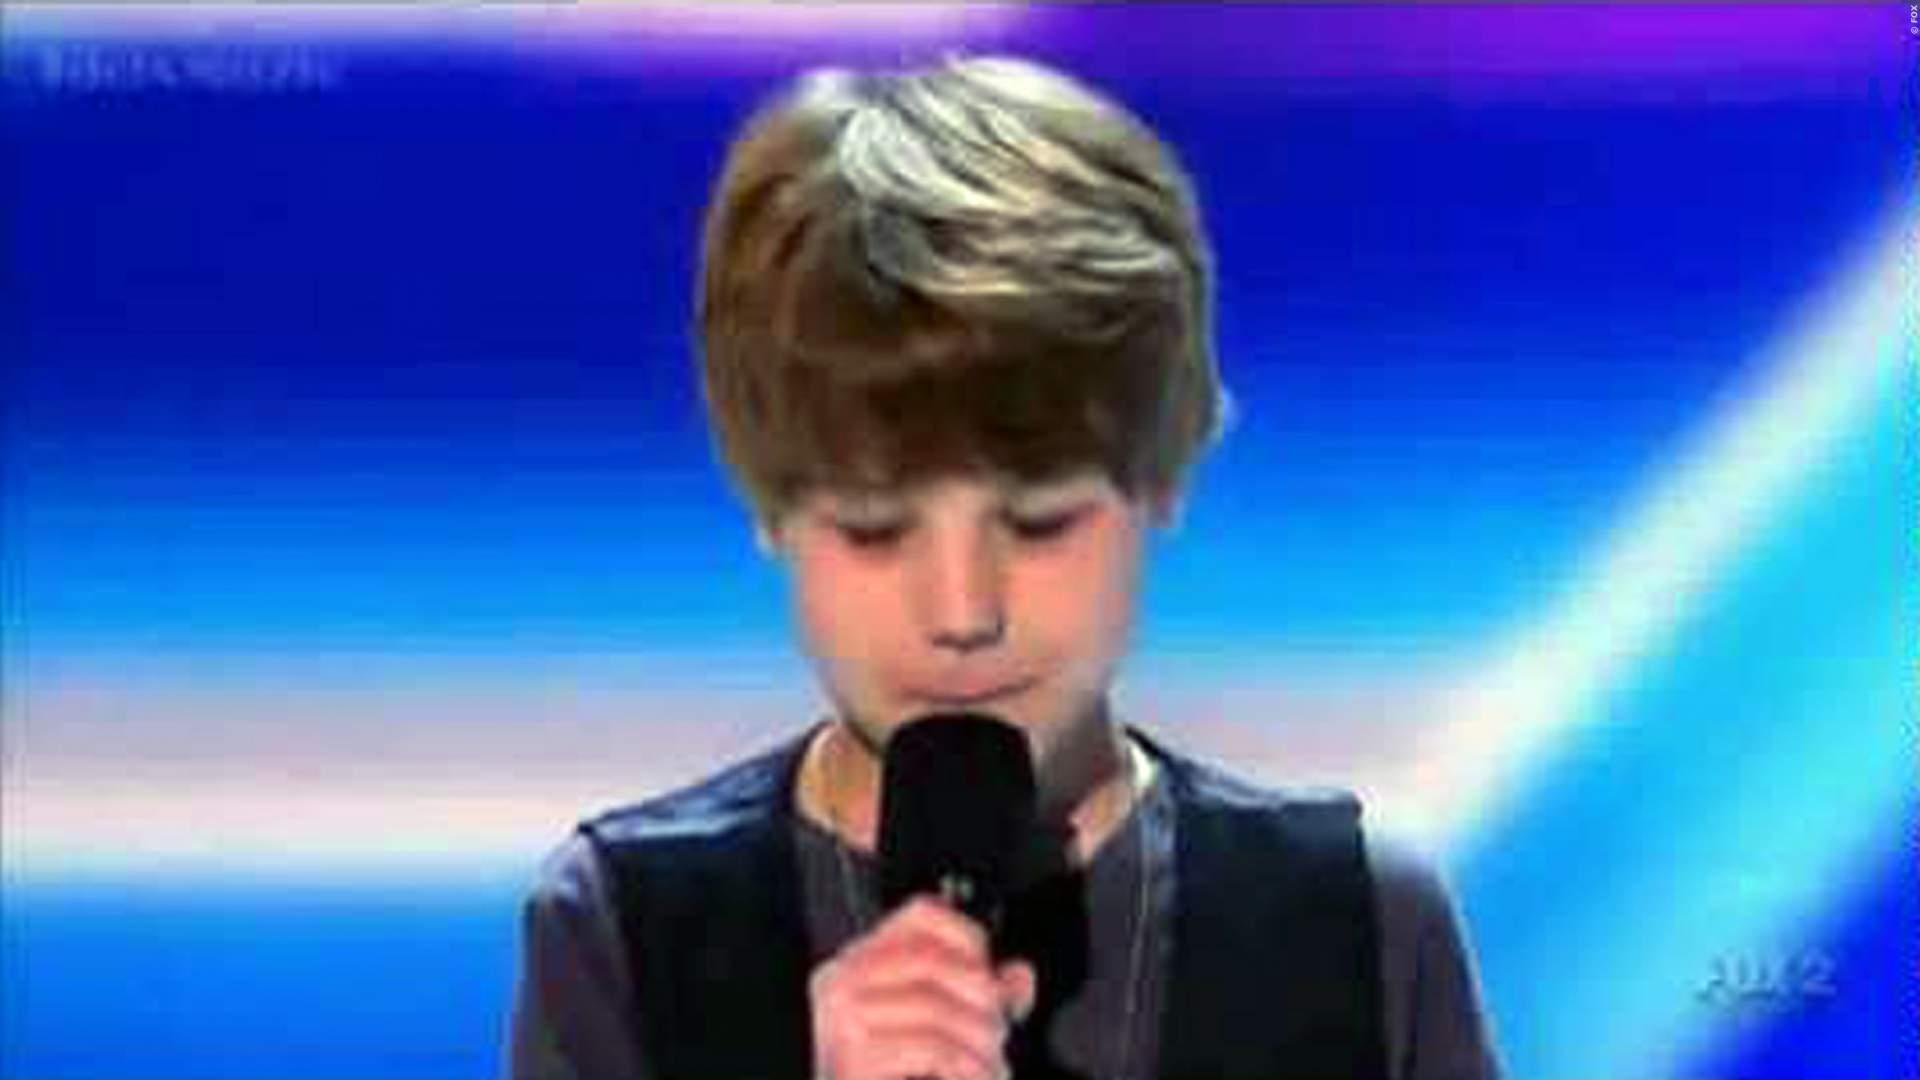 VIDEO: Justin Biebers lustiger erster Auftritt bei X-Factor - Damals war er erst 13!